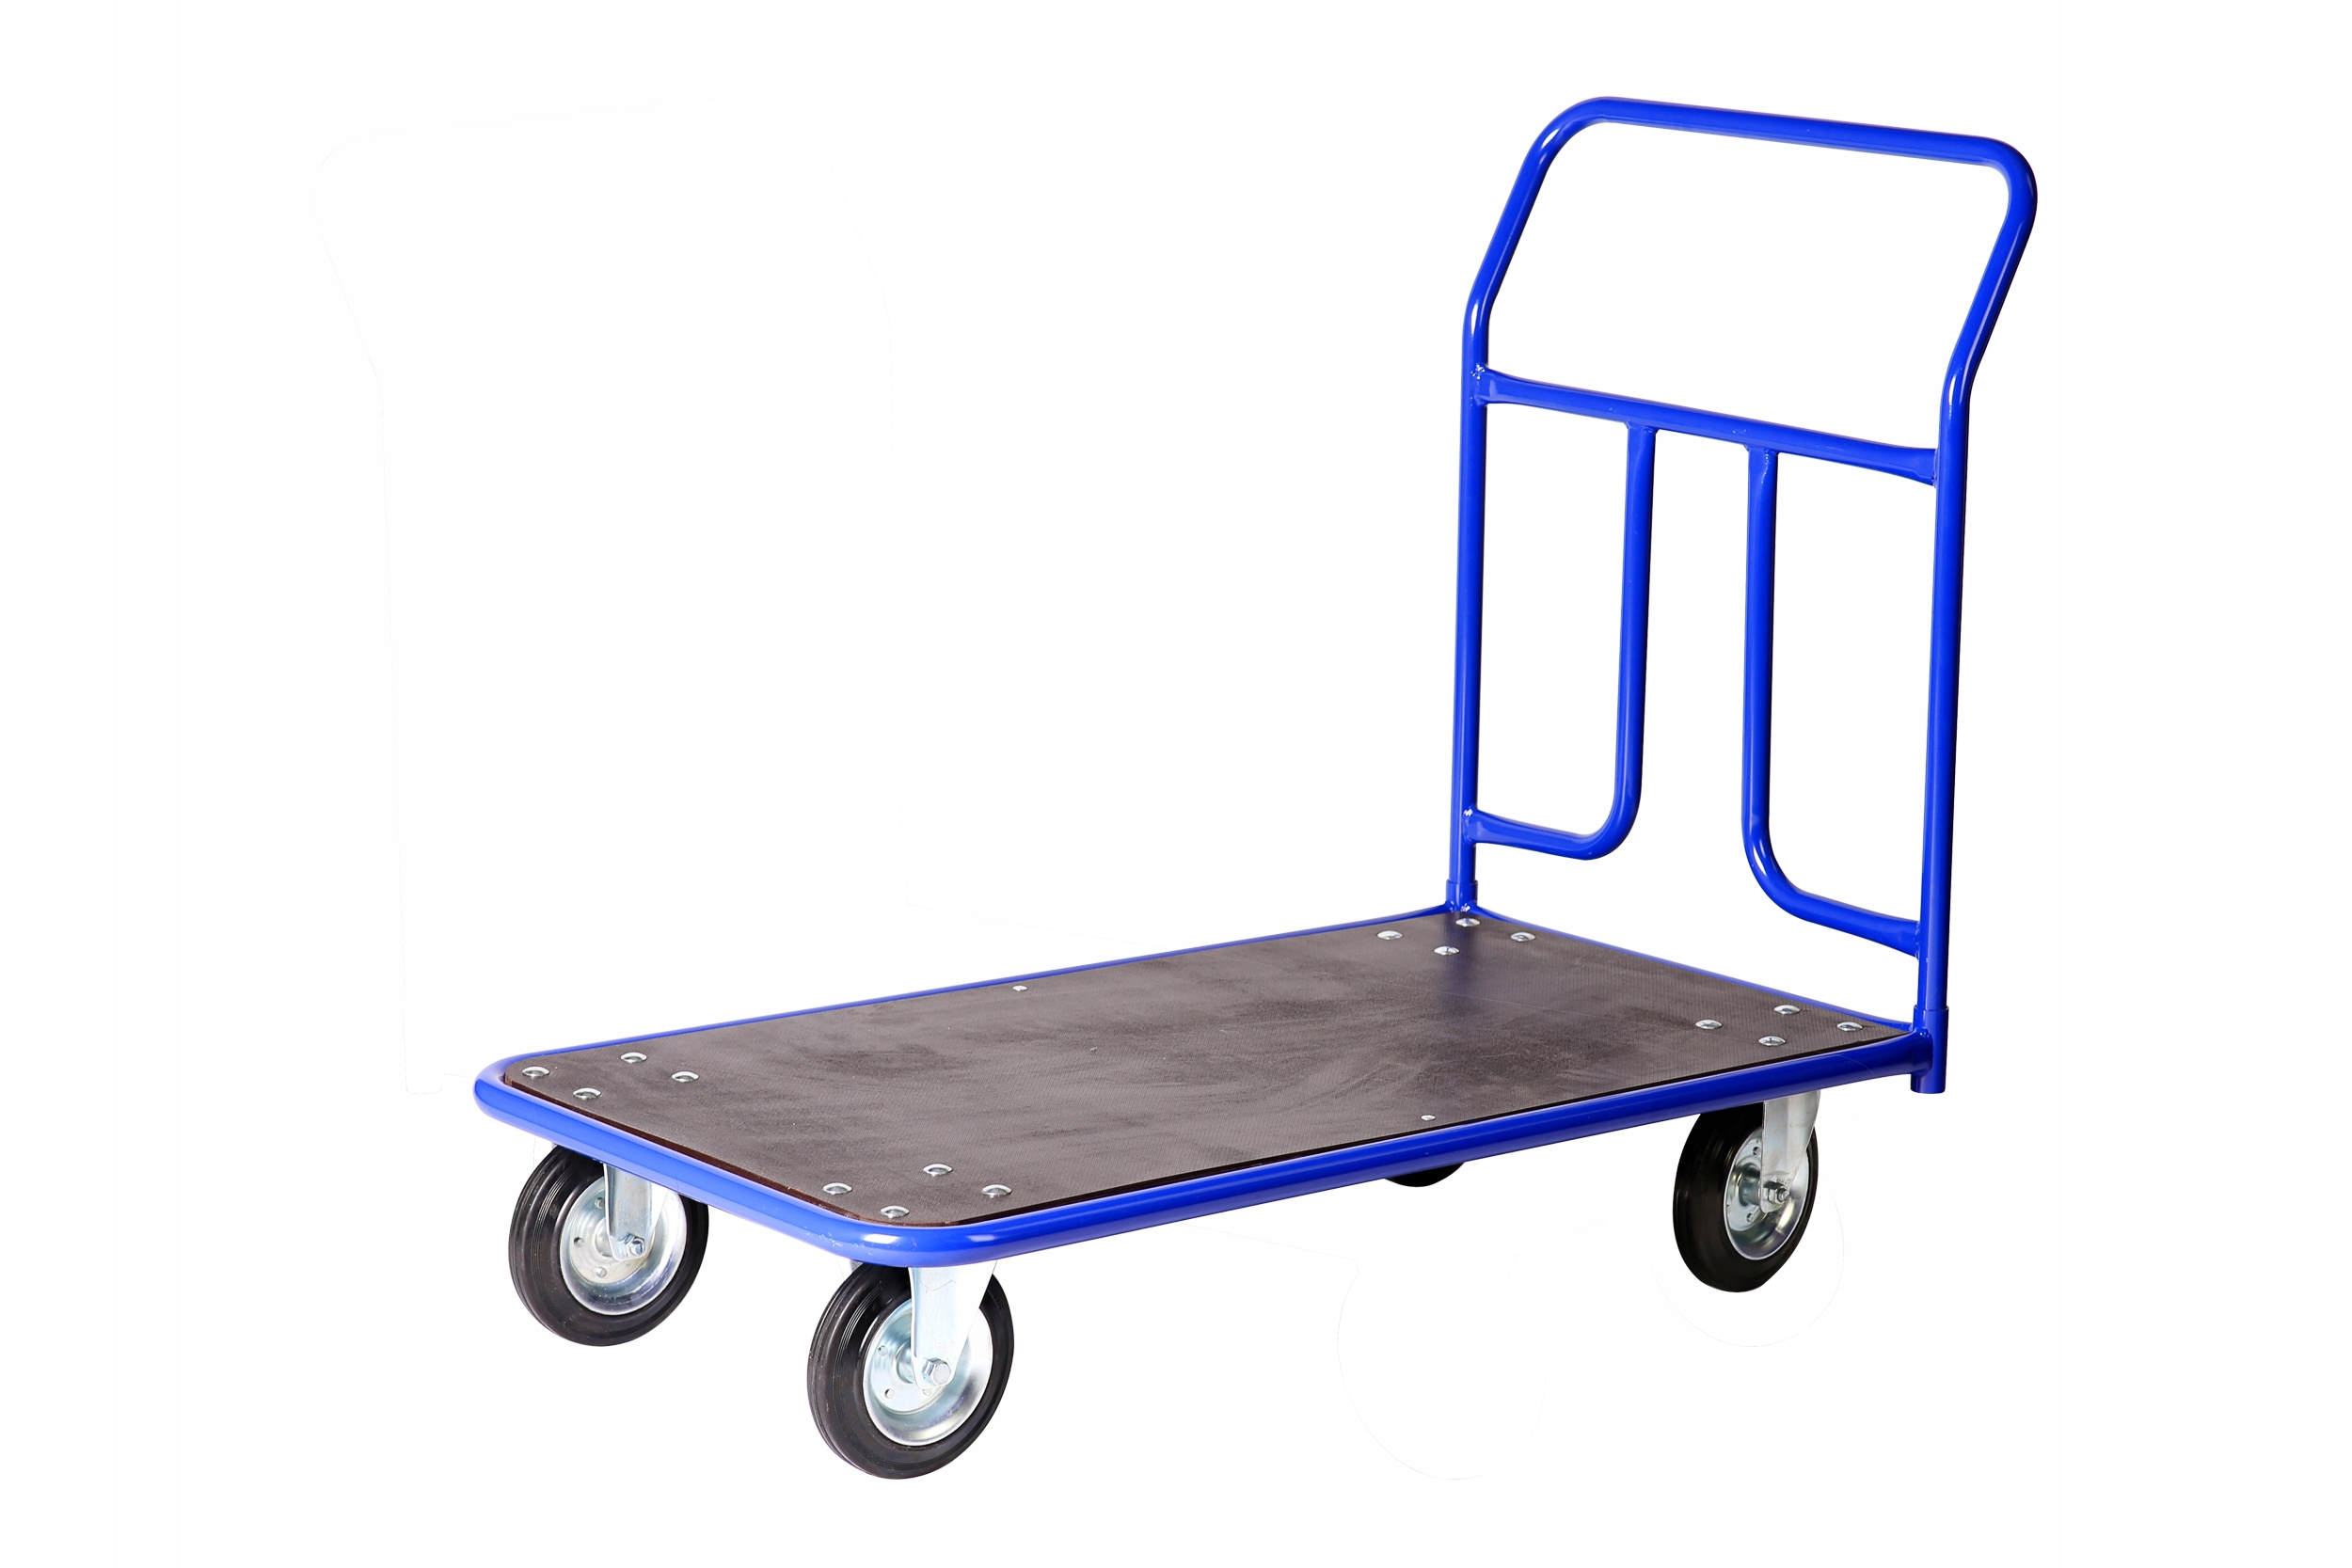 Коляска PLATFORMOWY транспортная складская позиция 400 кг